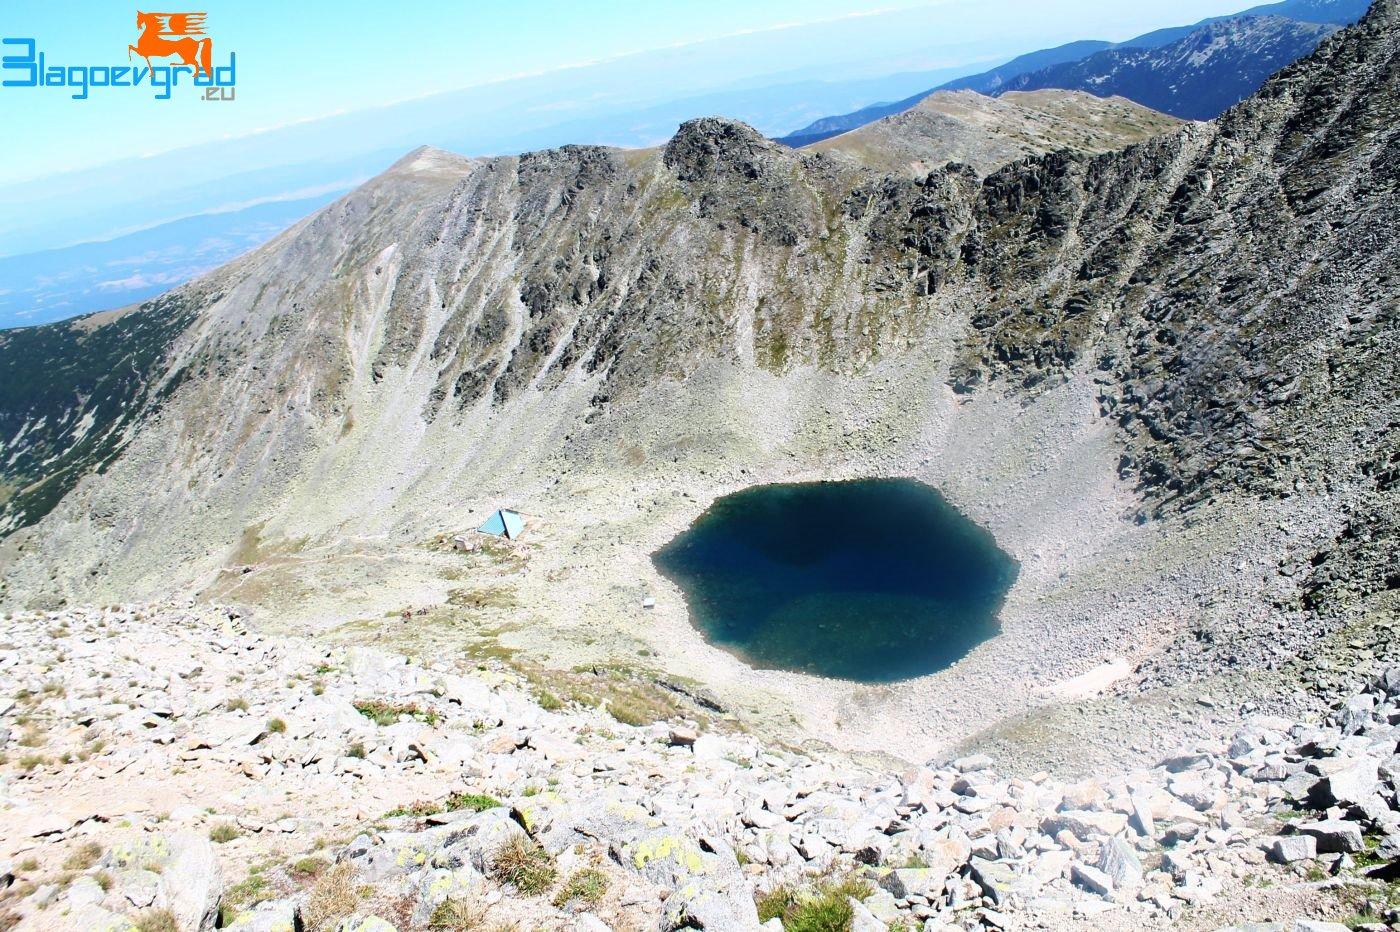 Леденото езеро - към връх Мусала Musala Peak Glacial lake